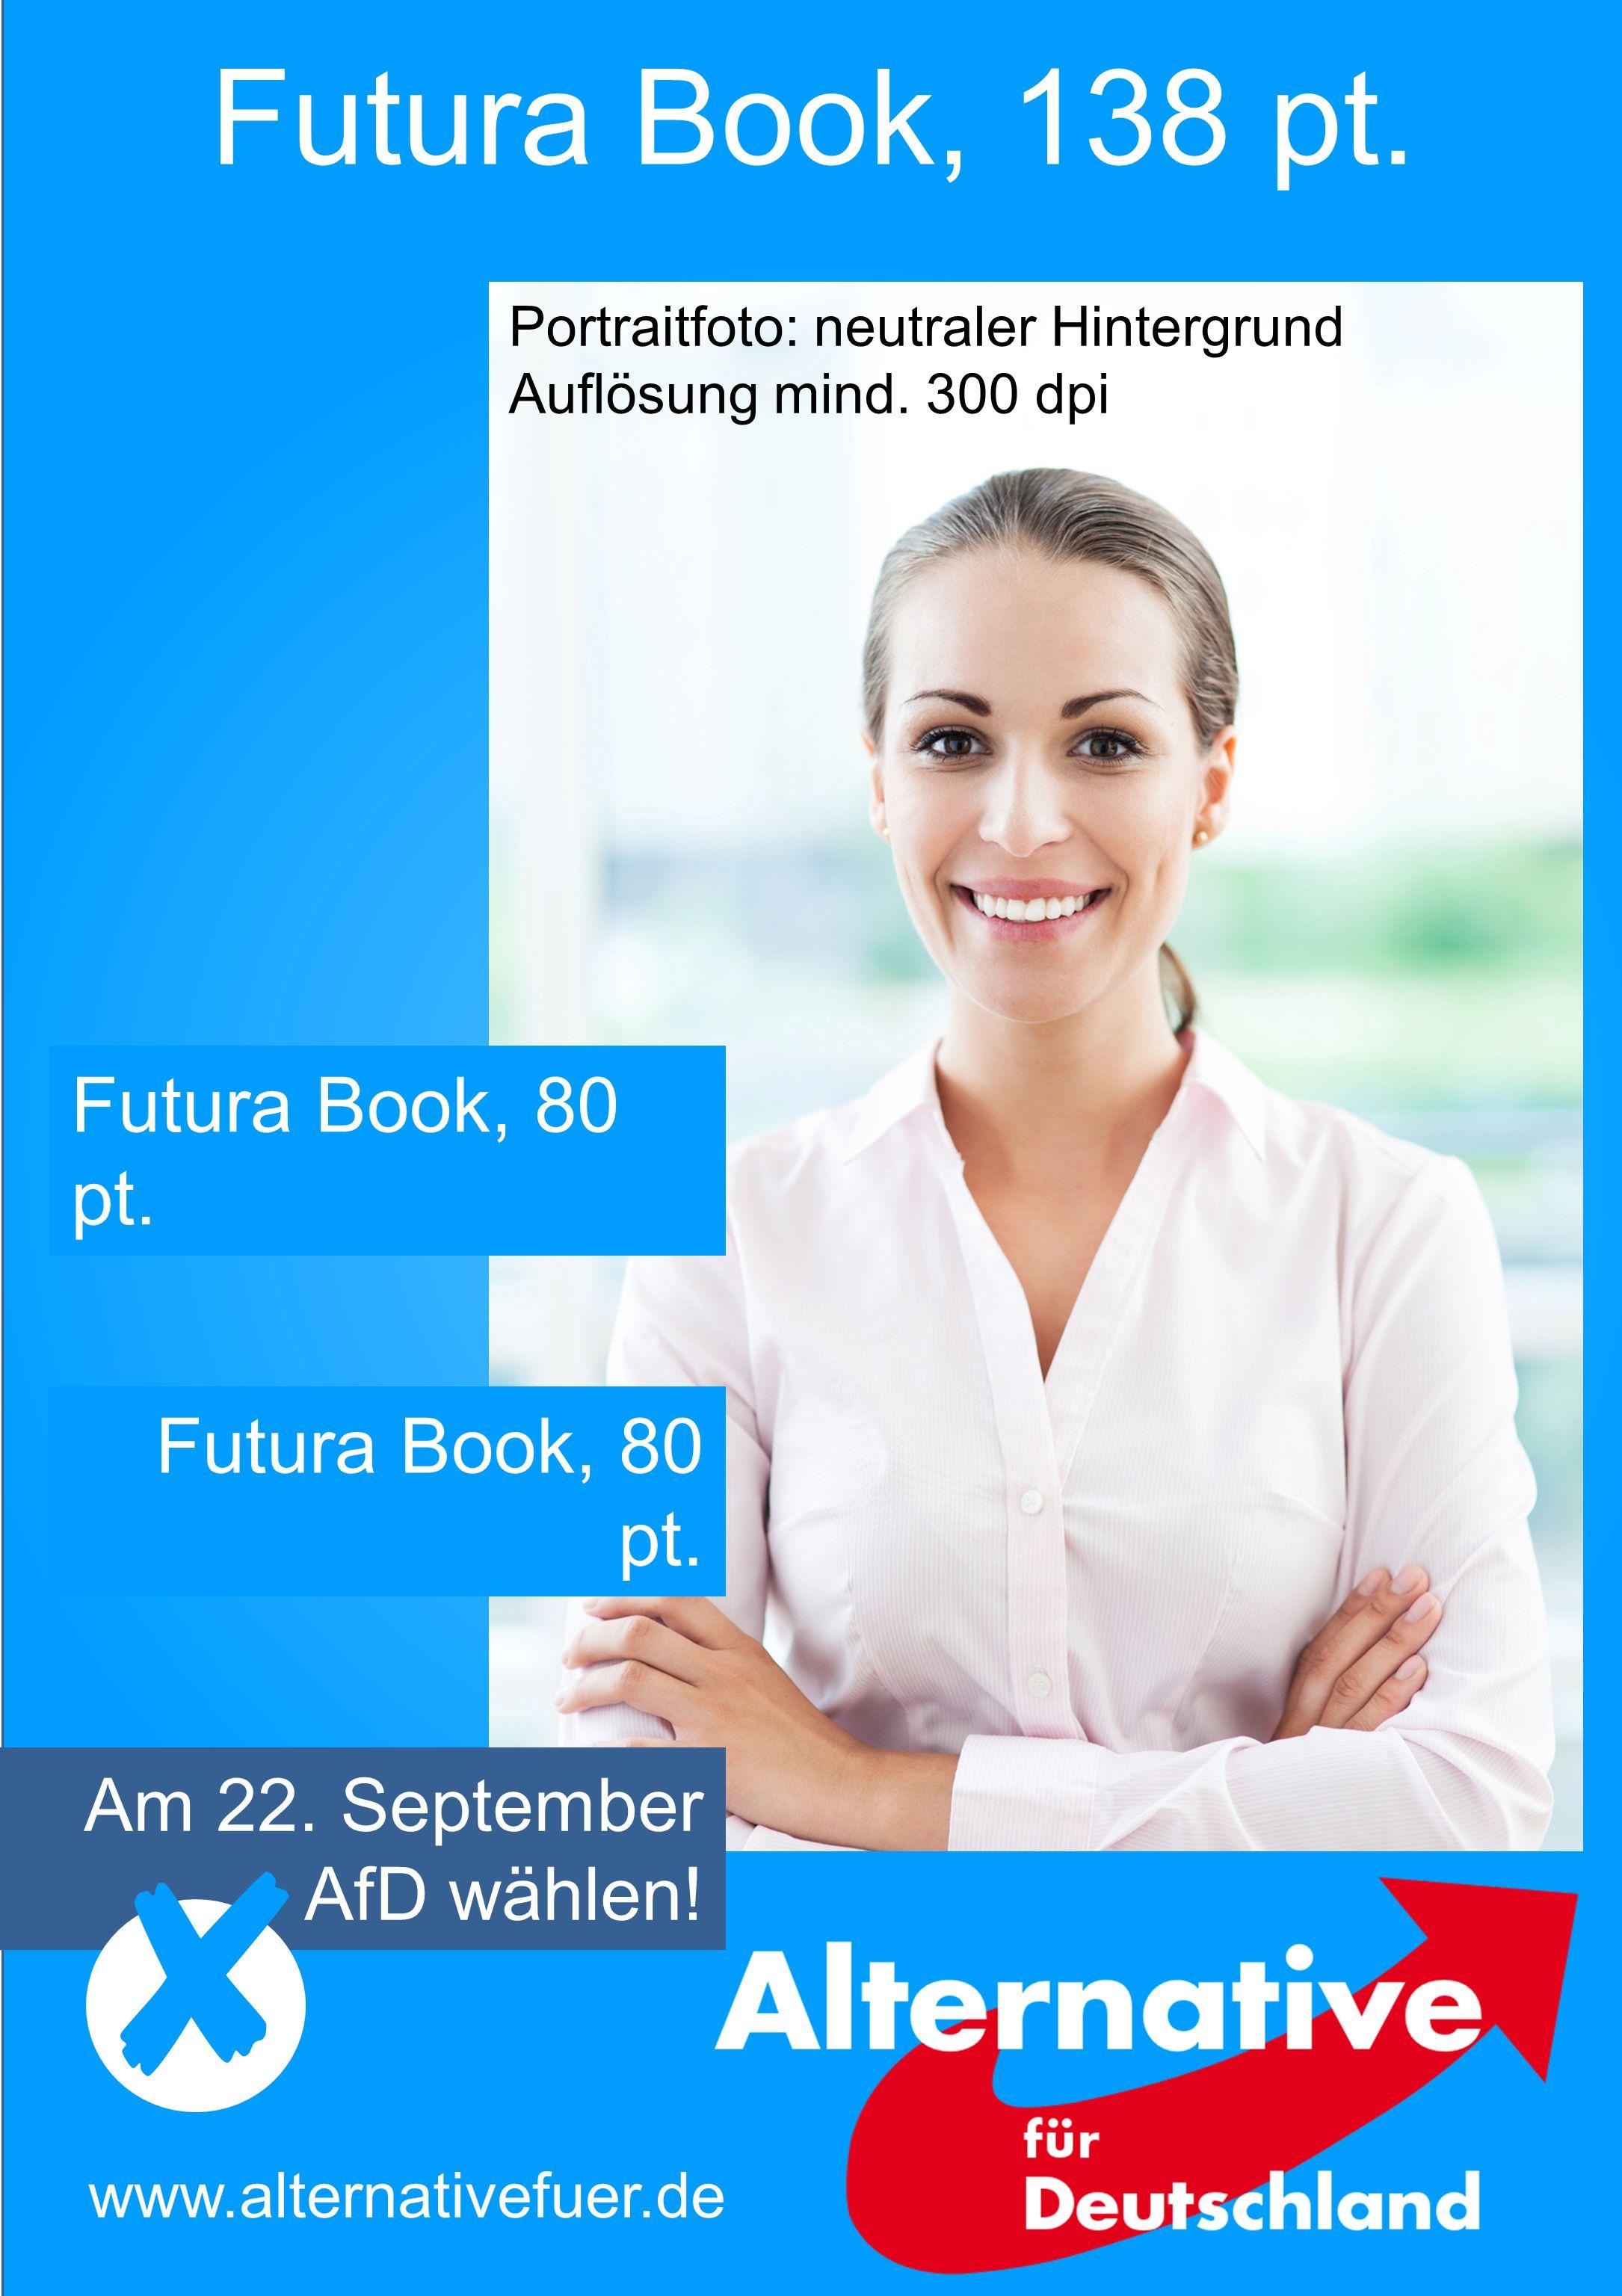 Futura Book, 138 pt. Am 22. September AfD wählen! www.alternativefuer.de Futura Book, 80 pt. Portraitfoto: neutraler Hintergrund Auflösung mind. 300 d